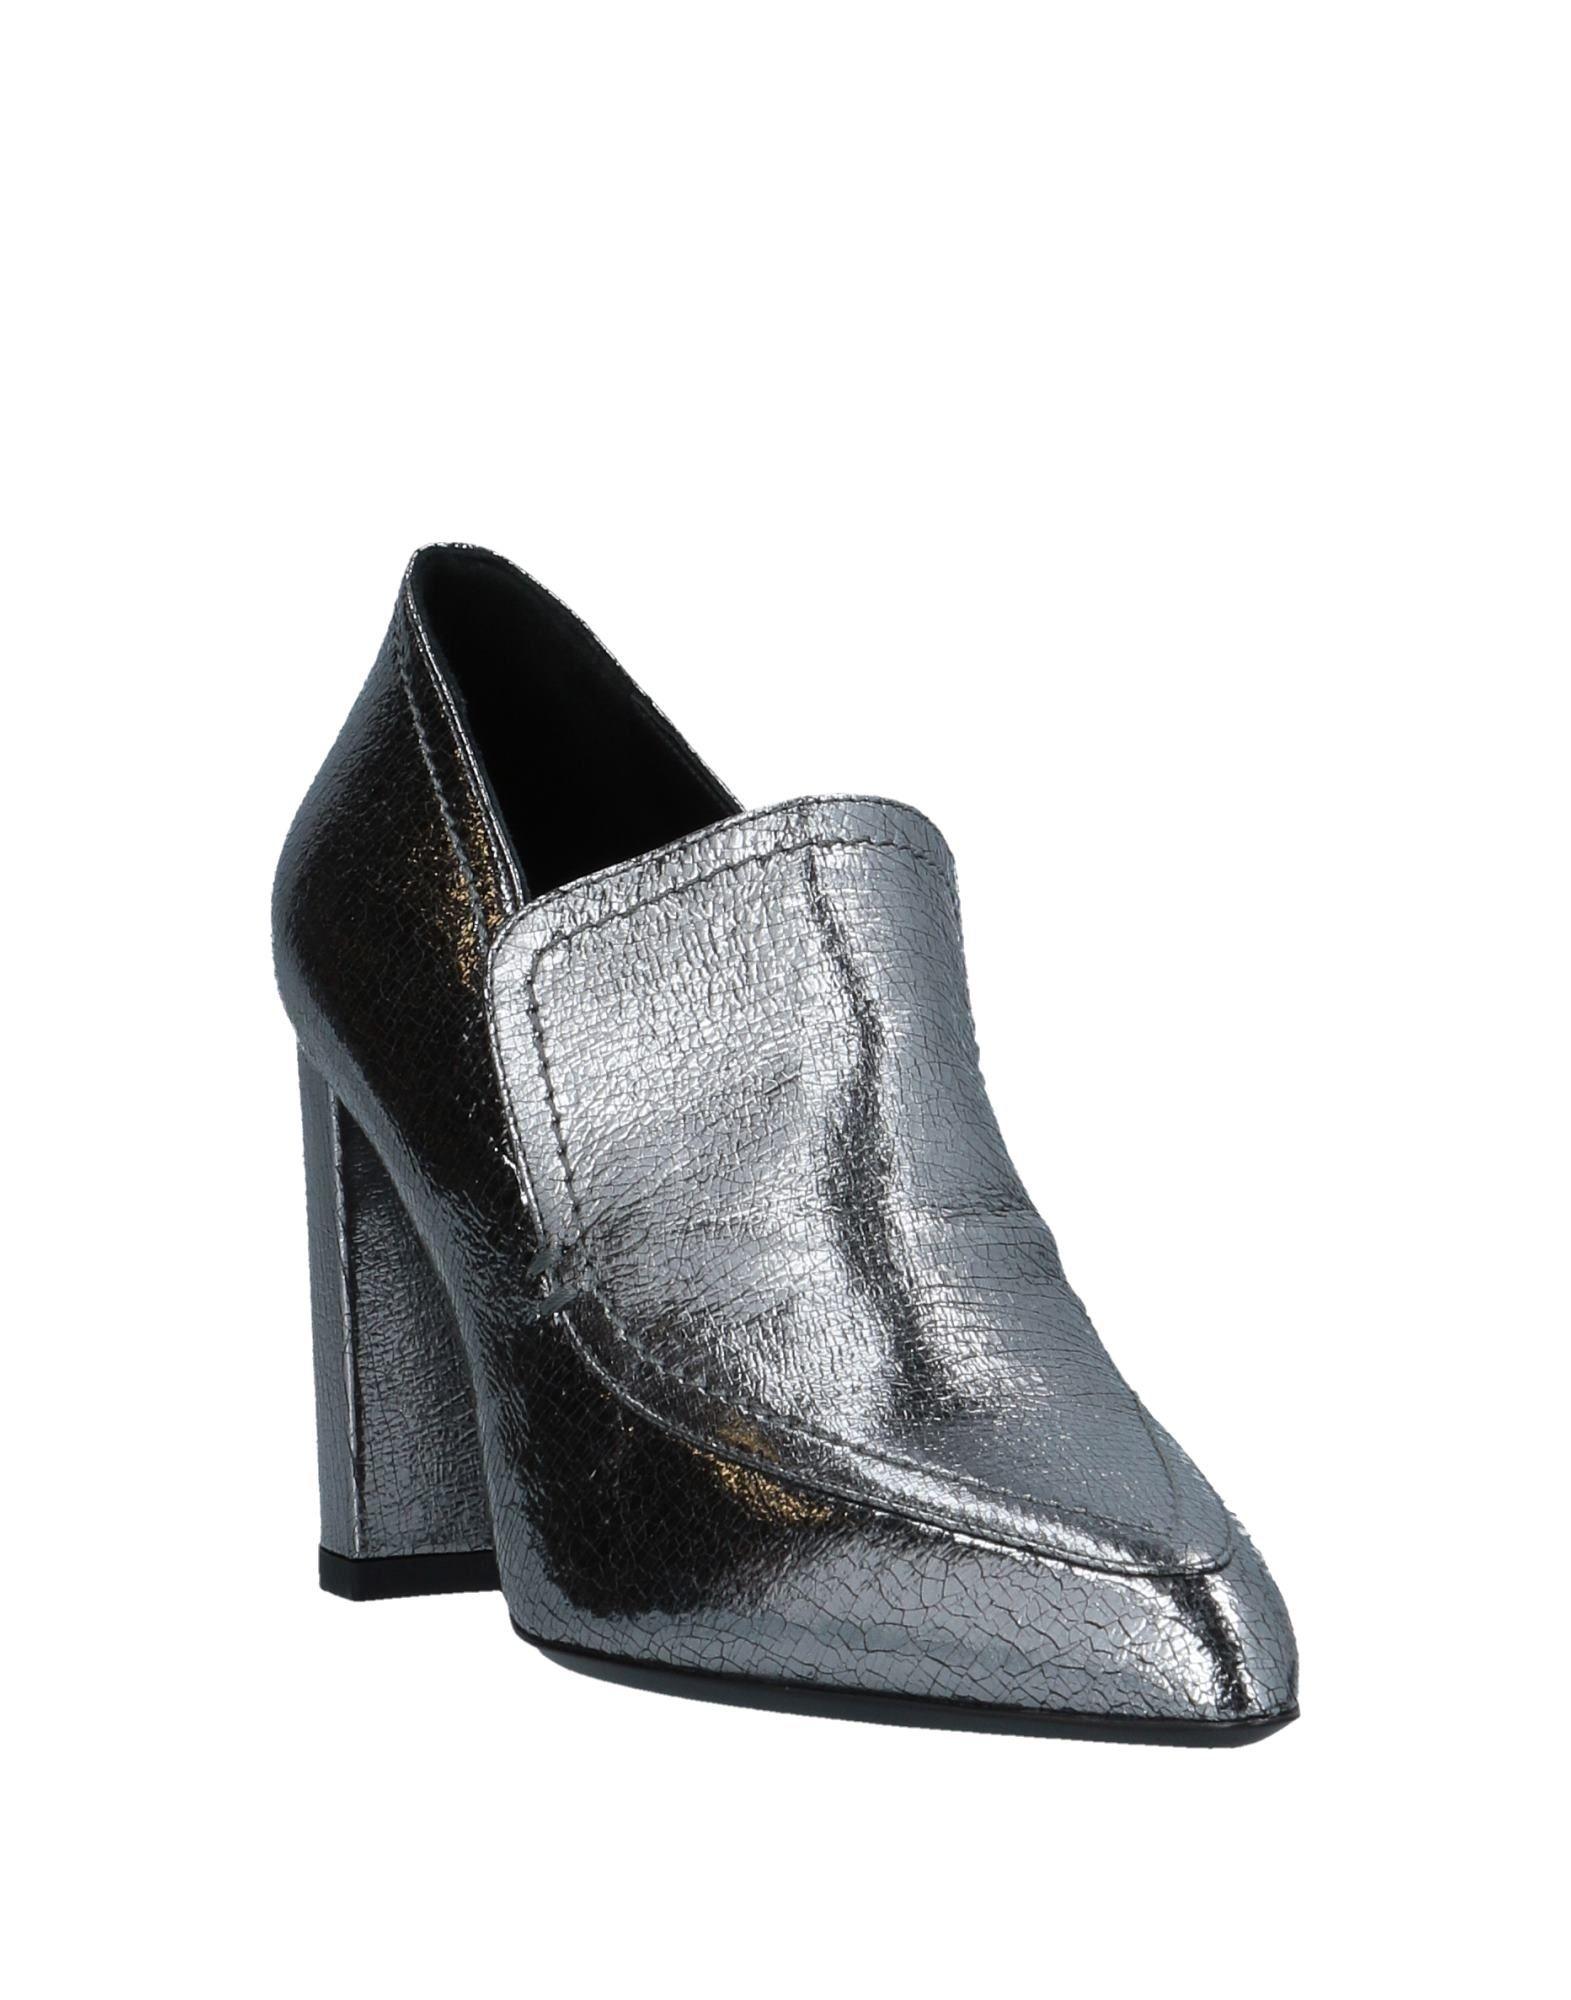 Fratelli 11532487VBGut Karida Mokassins Damen  11532487VBGut Fratelli aussehende strapazierfähige Schuhe 9c6176